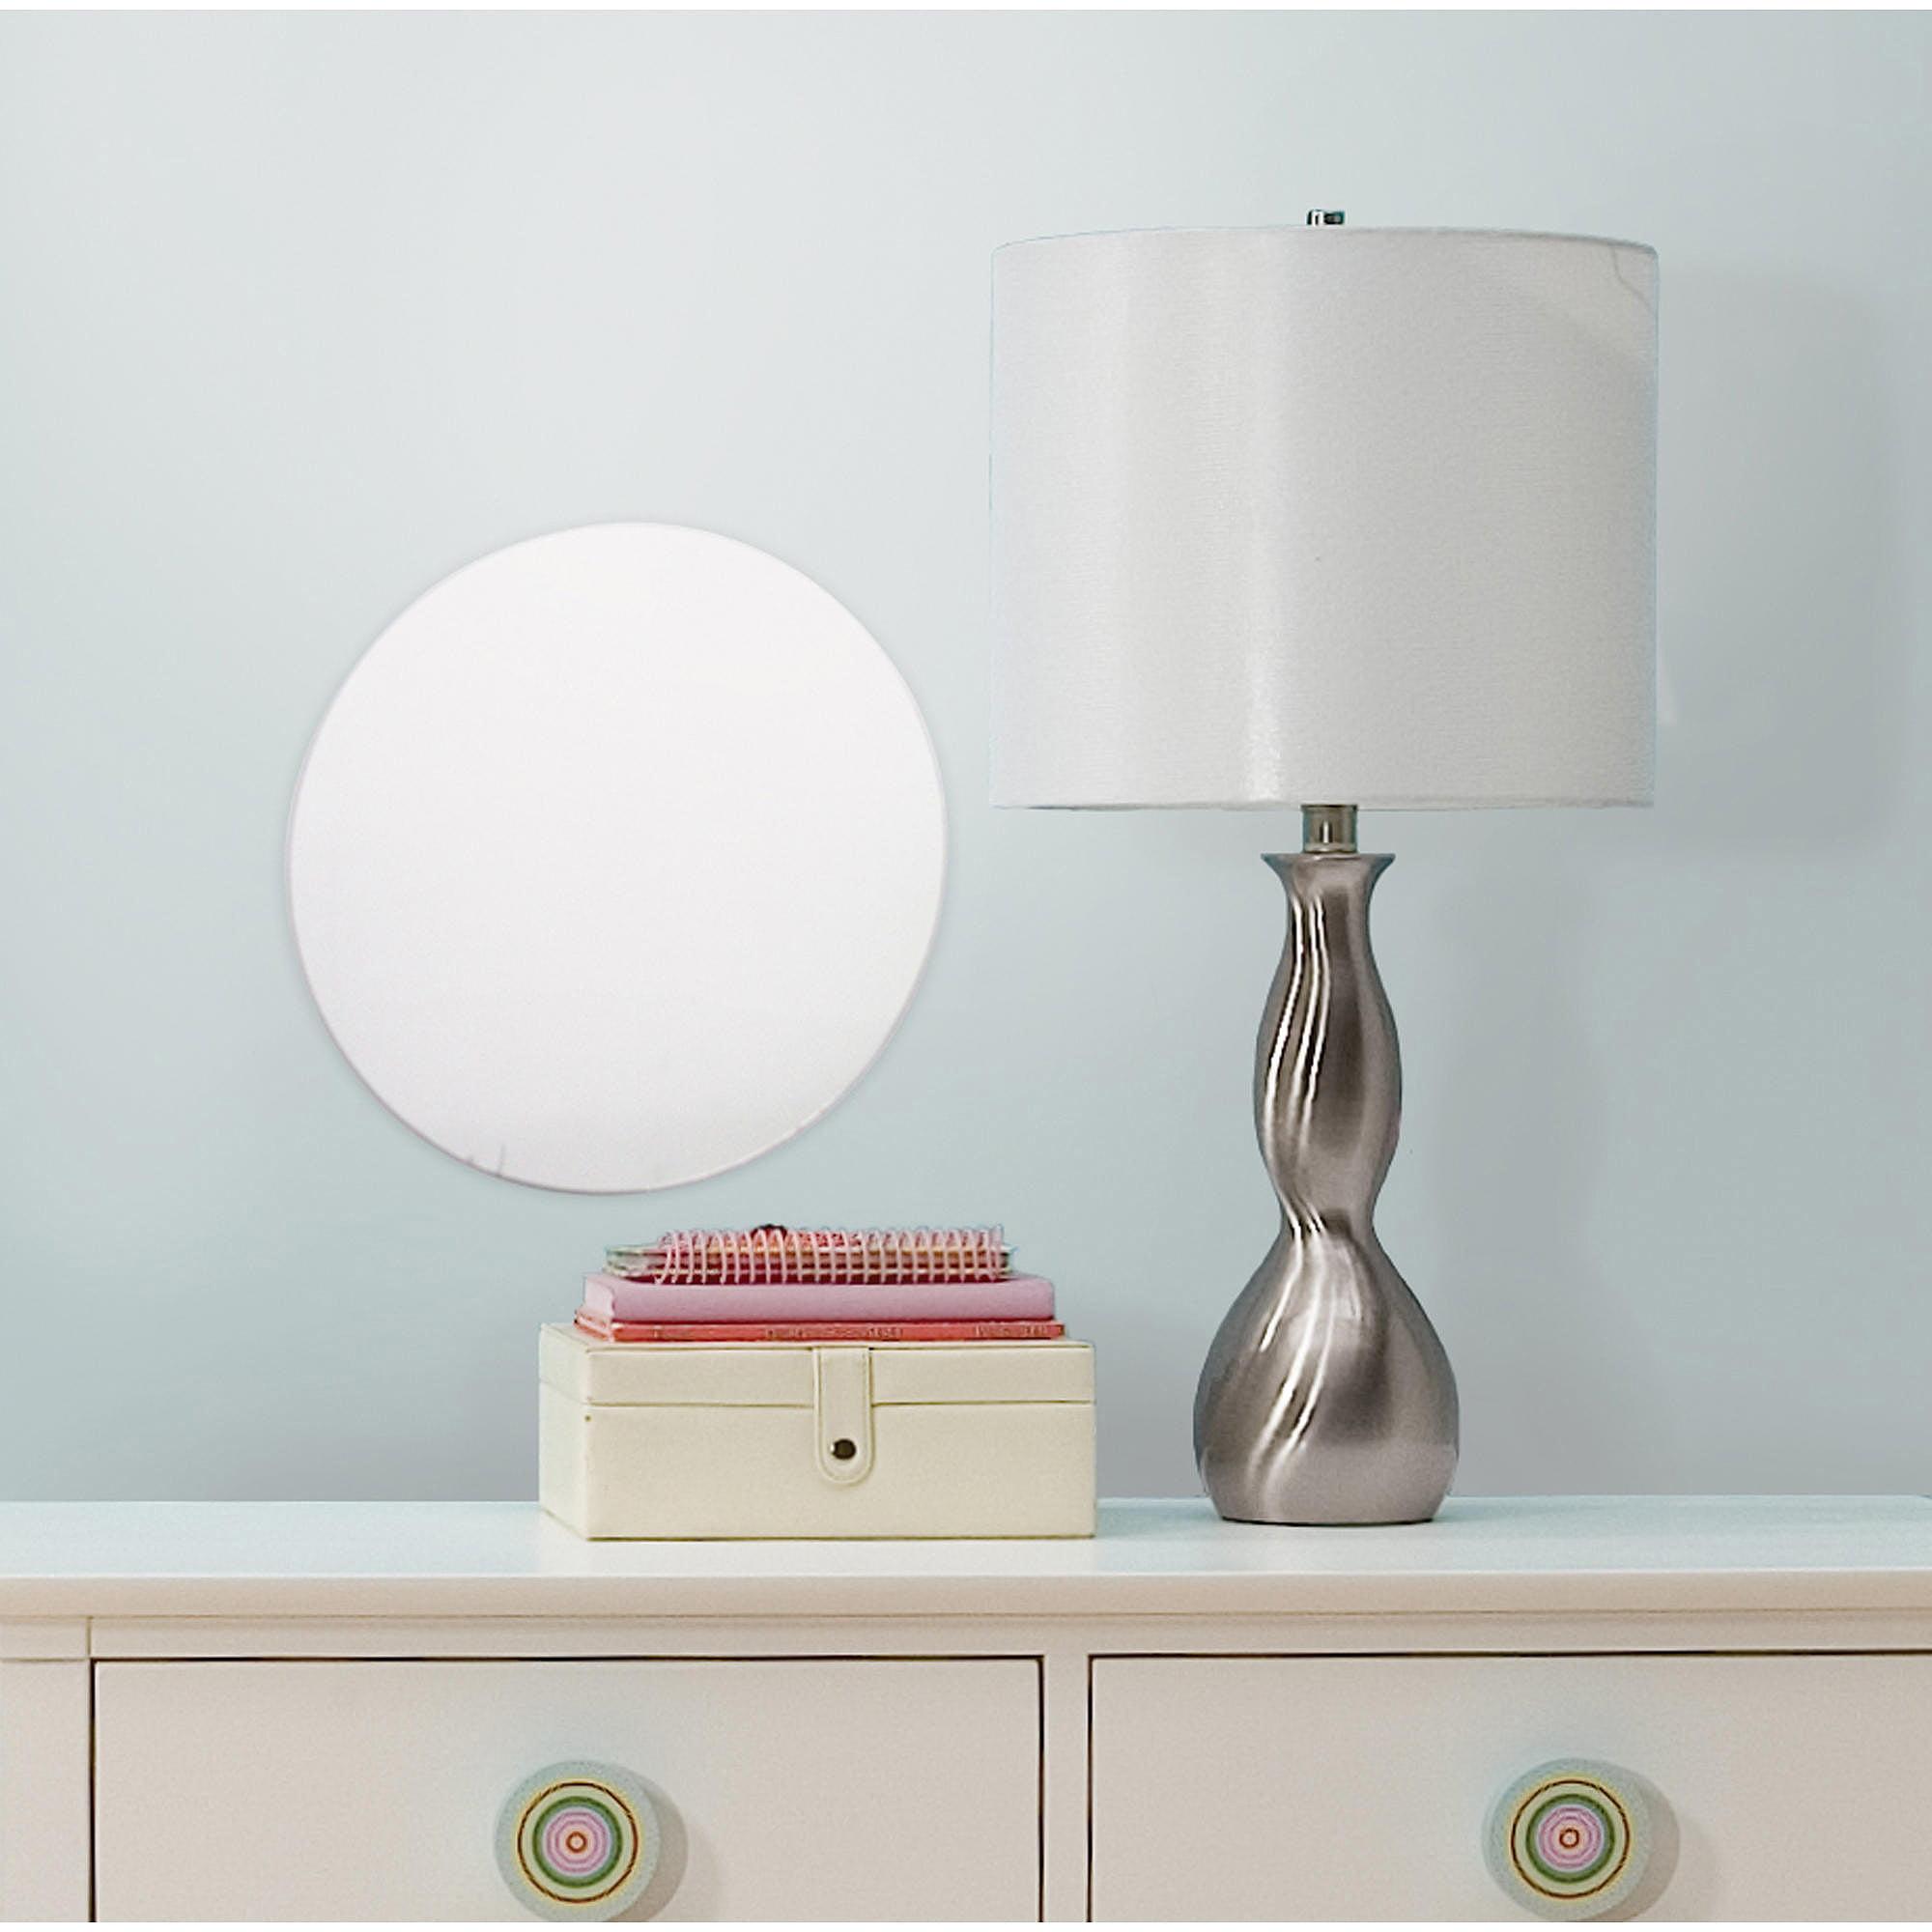 RoomMates Dot/Circle Peel and Stick Mirror, Large